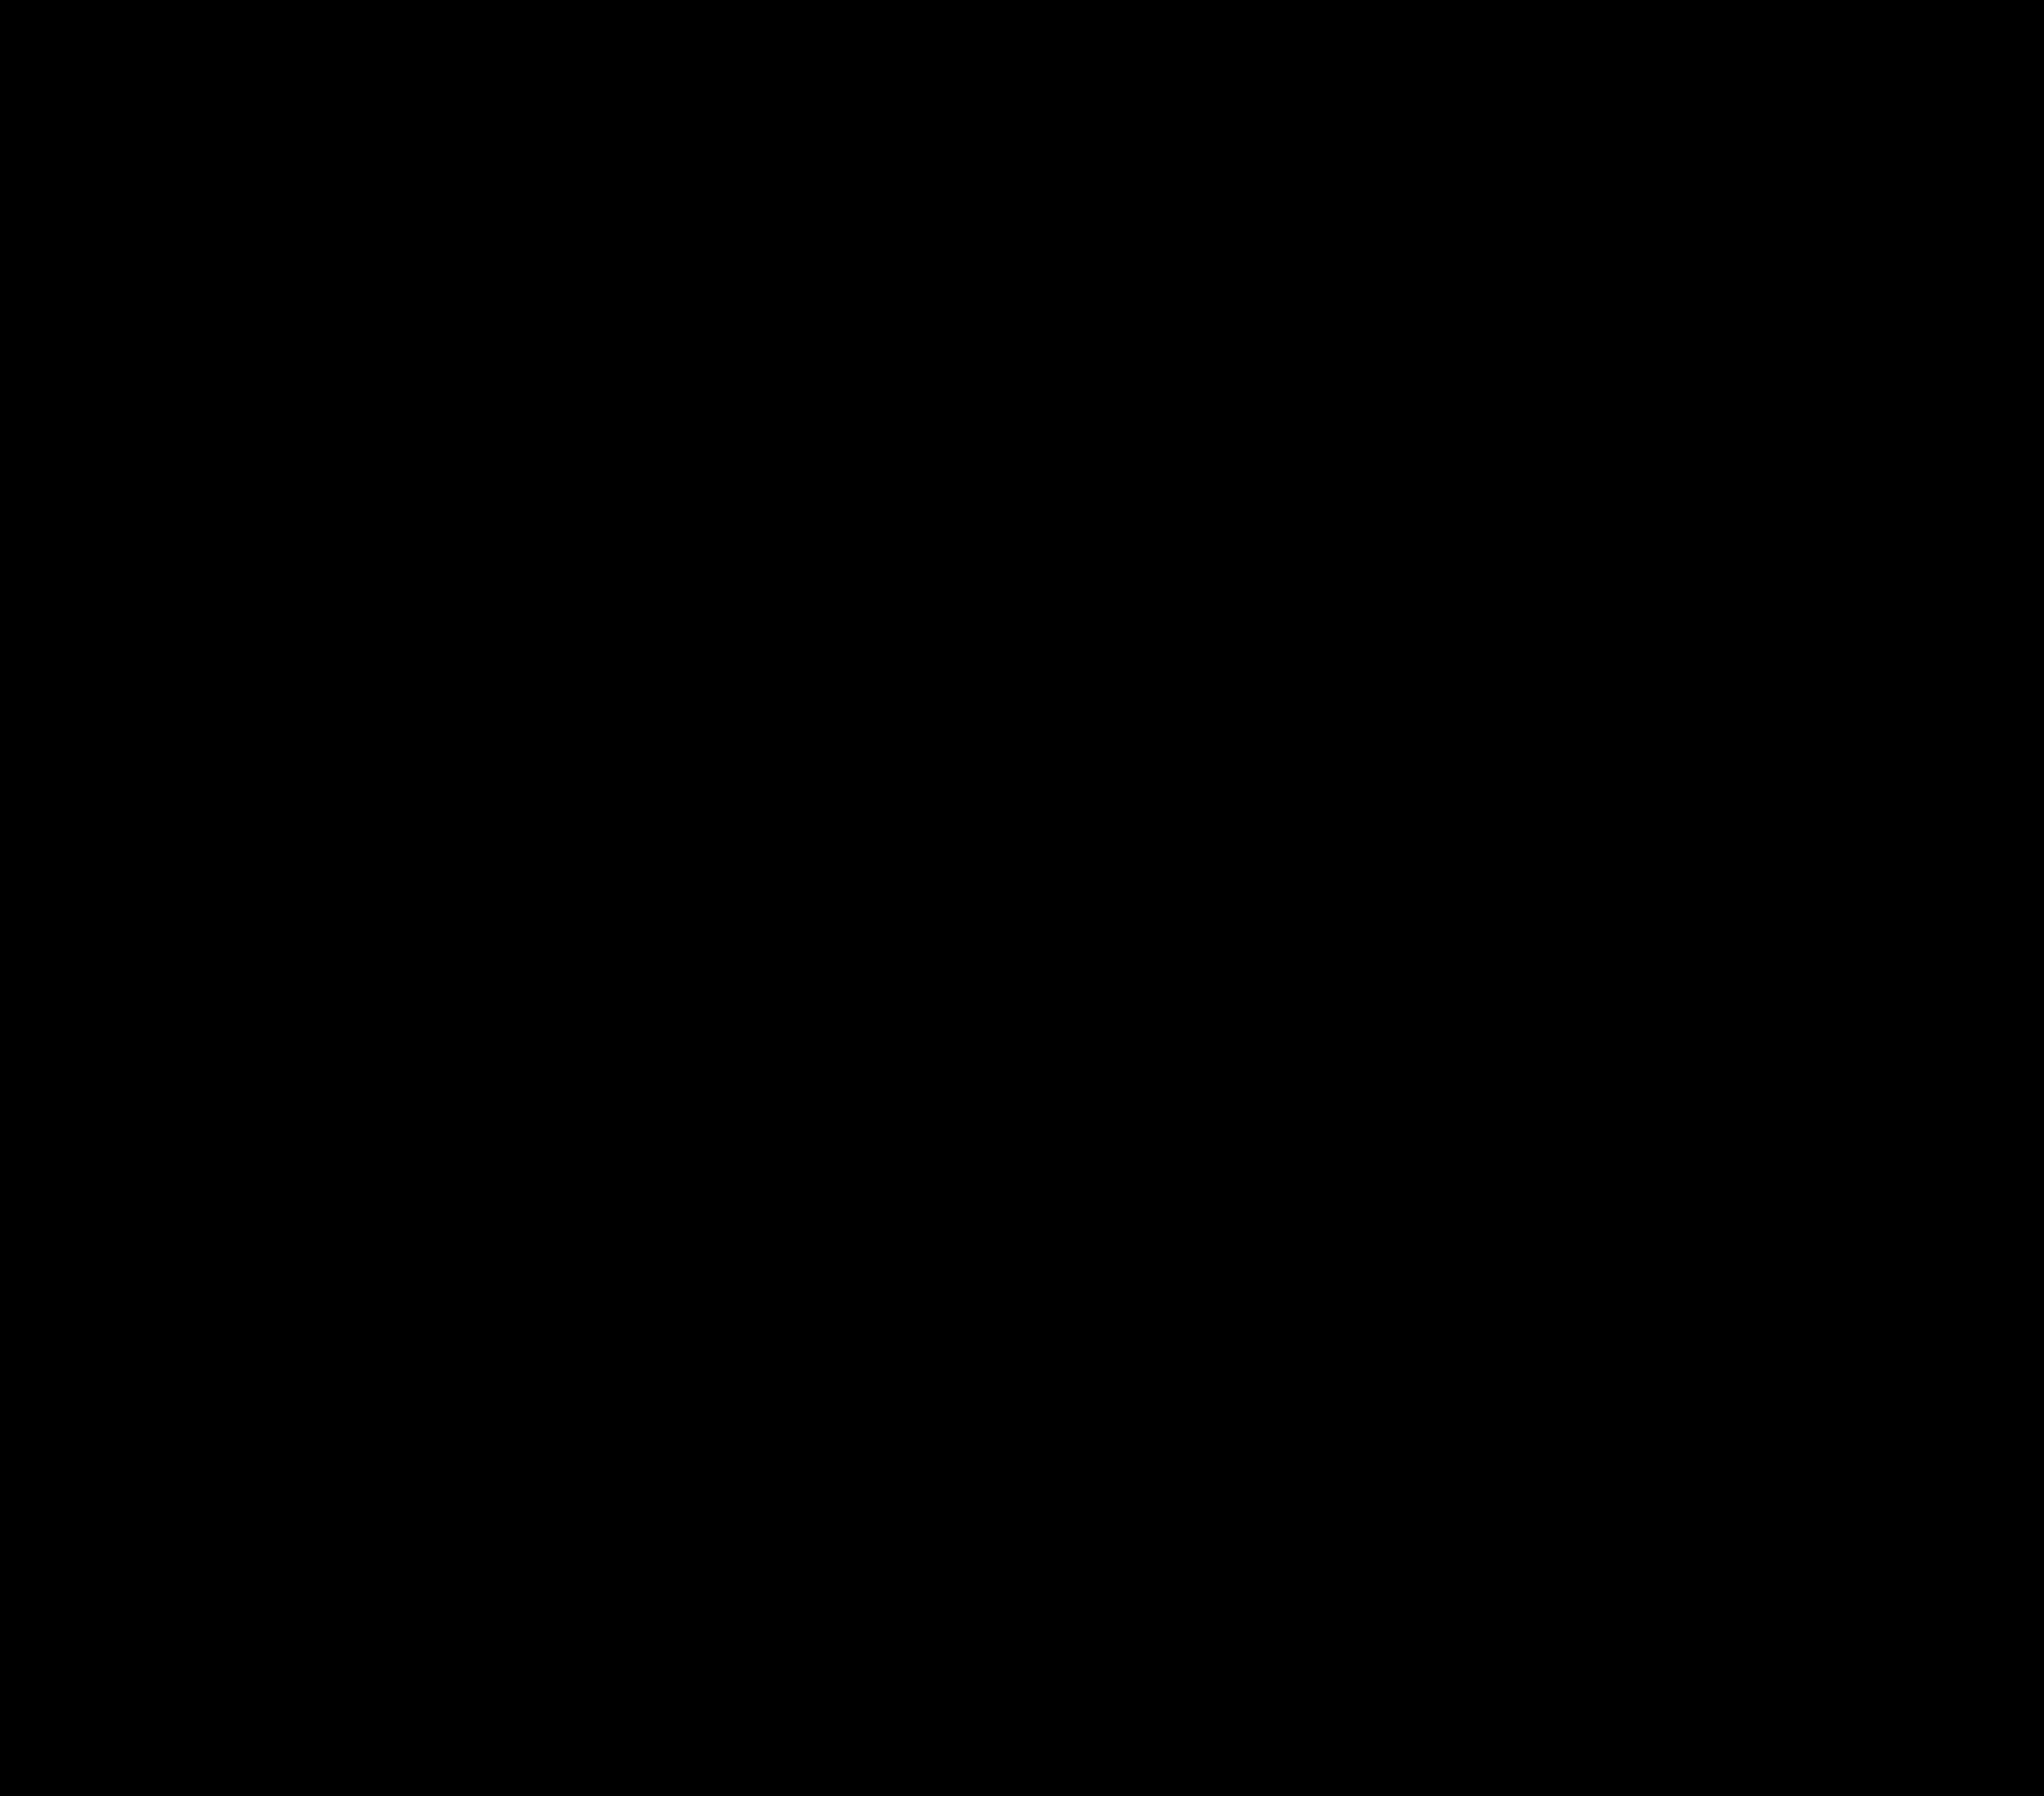 Outline clipartblack com animal. White clipart starfish